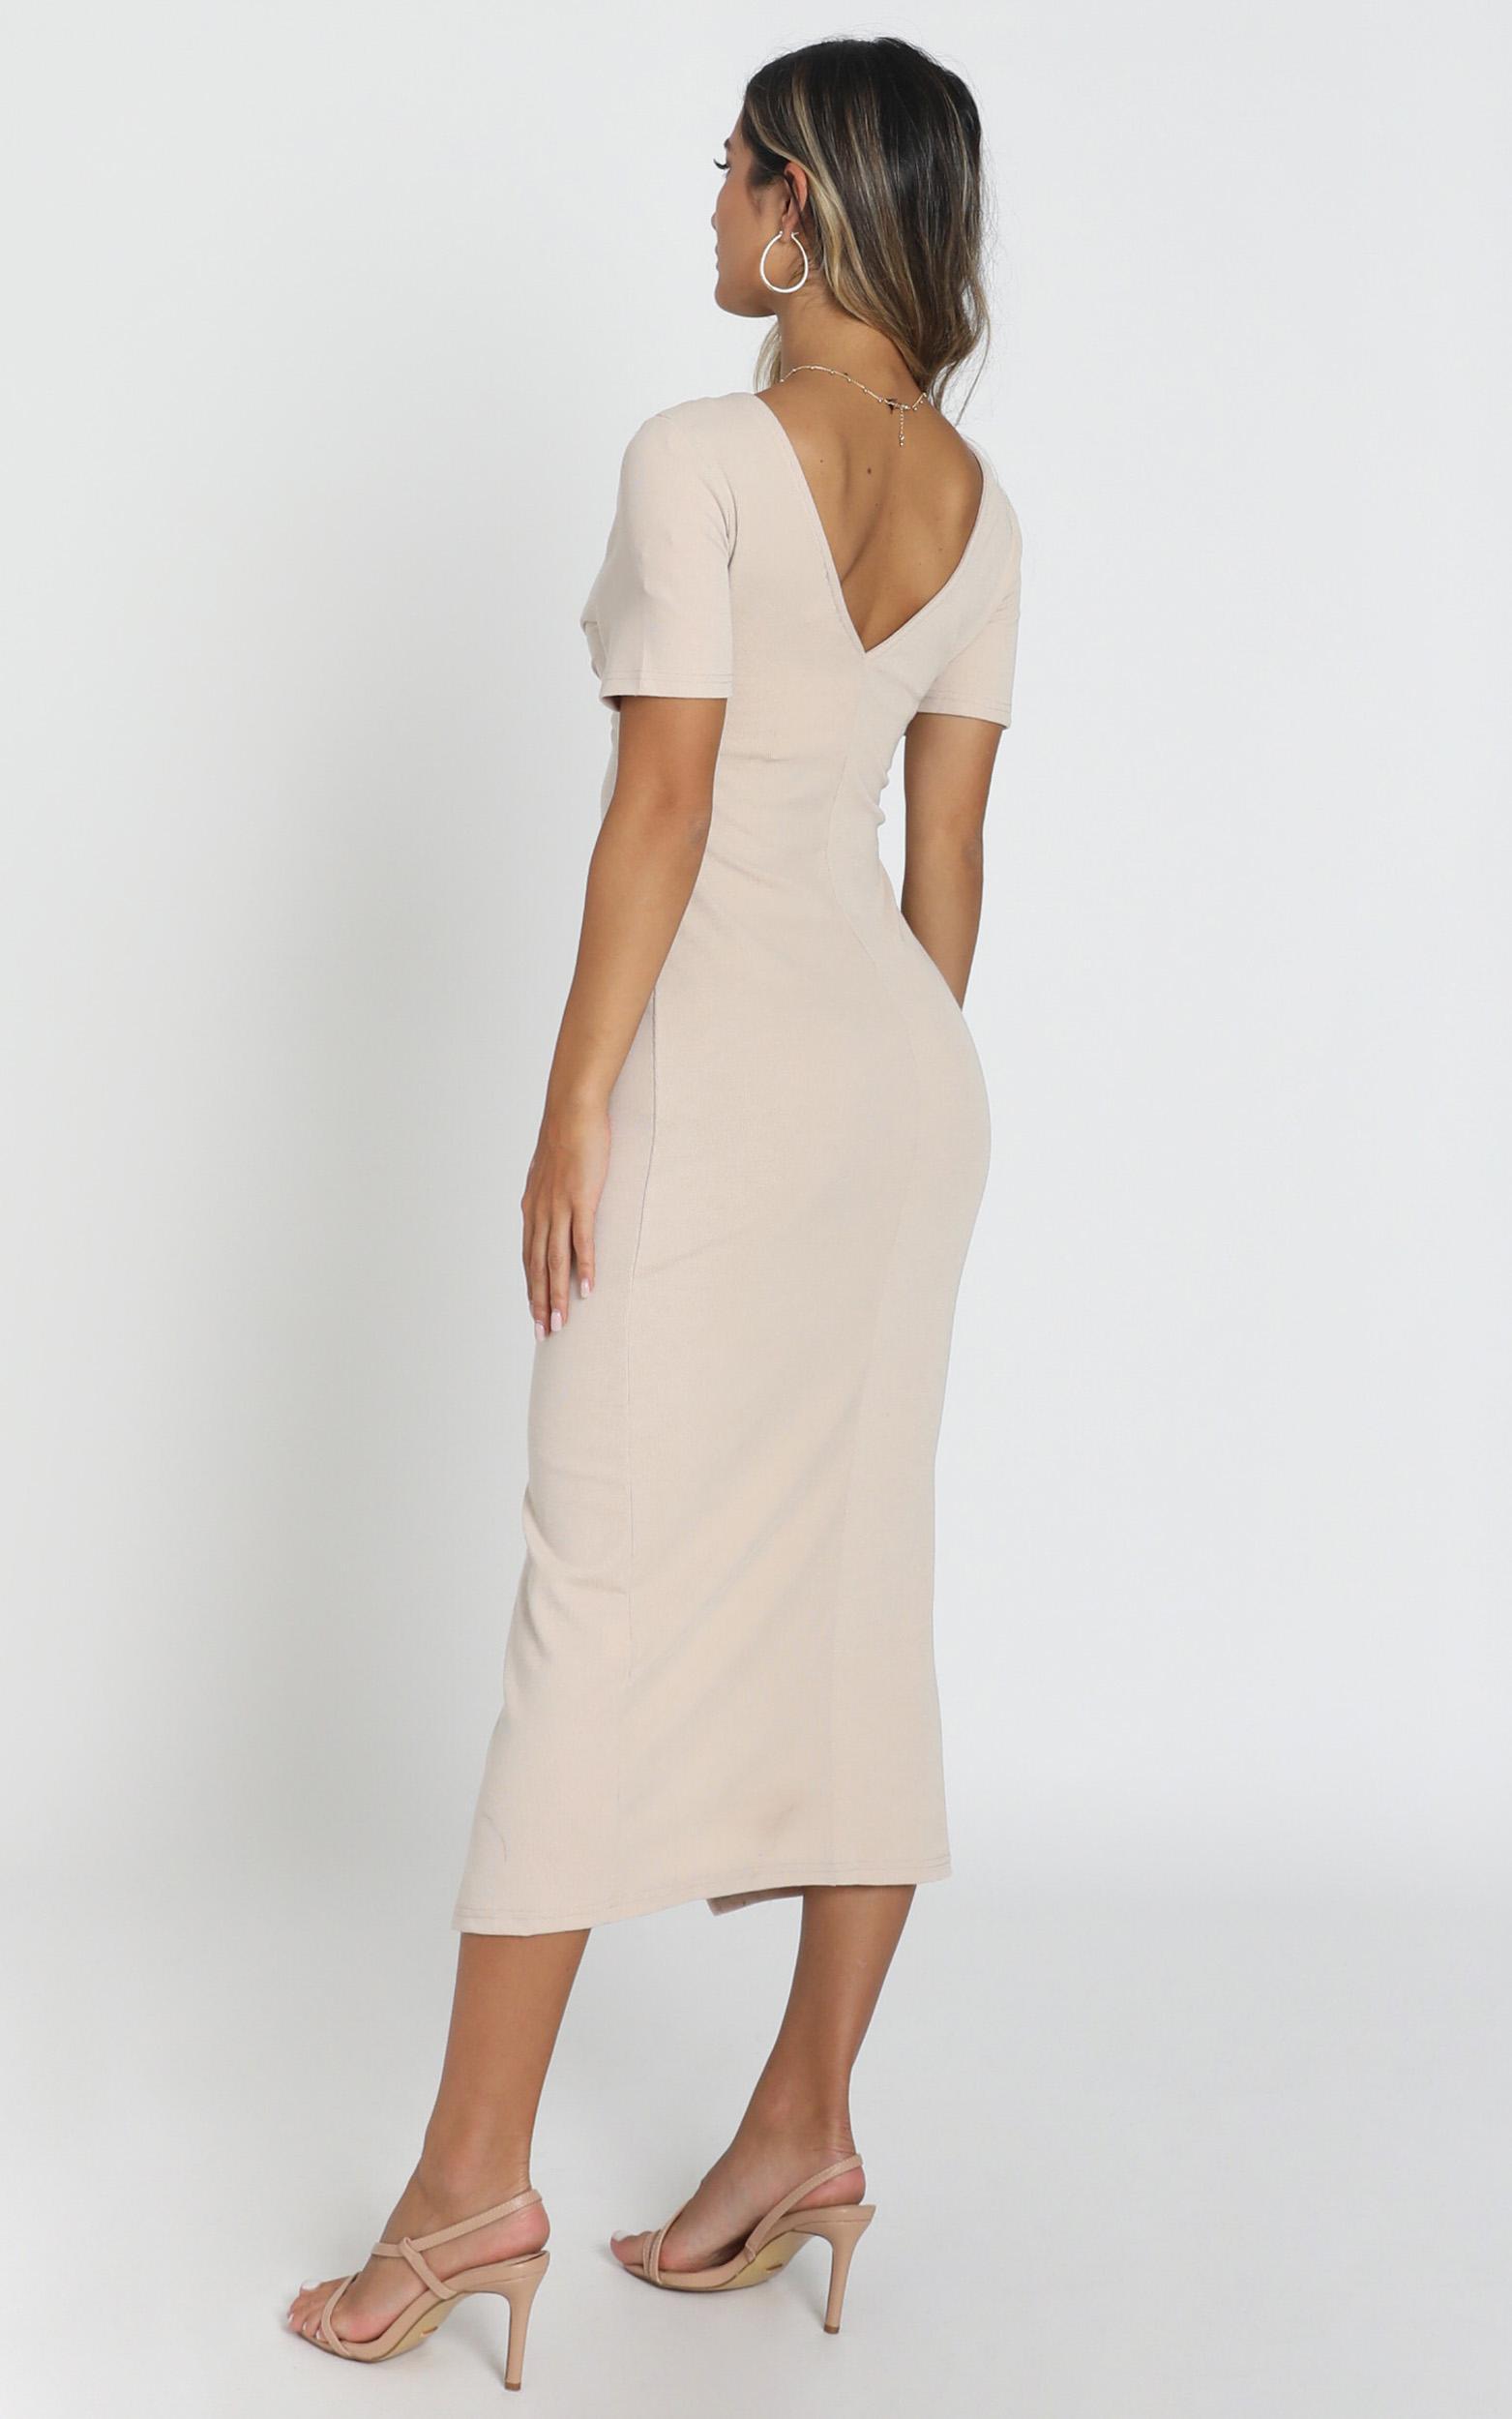 Press Rewind Dress in beige - 16 (XXL), Beige, hi-res image number null